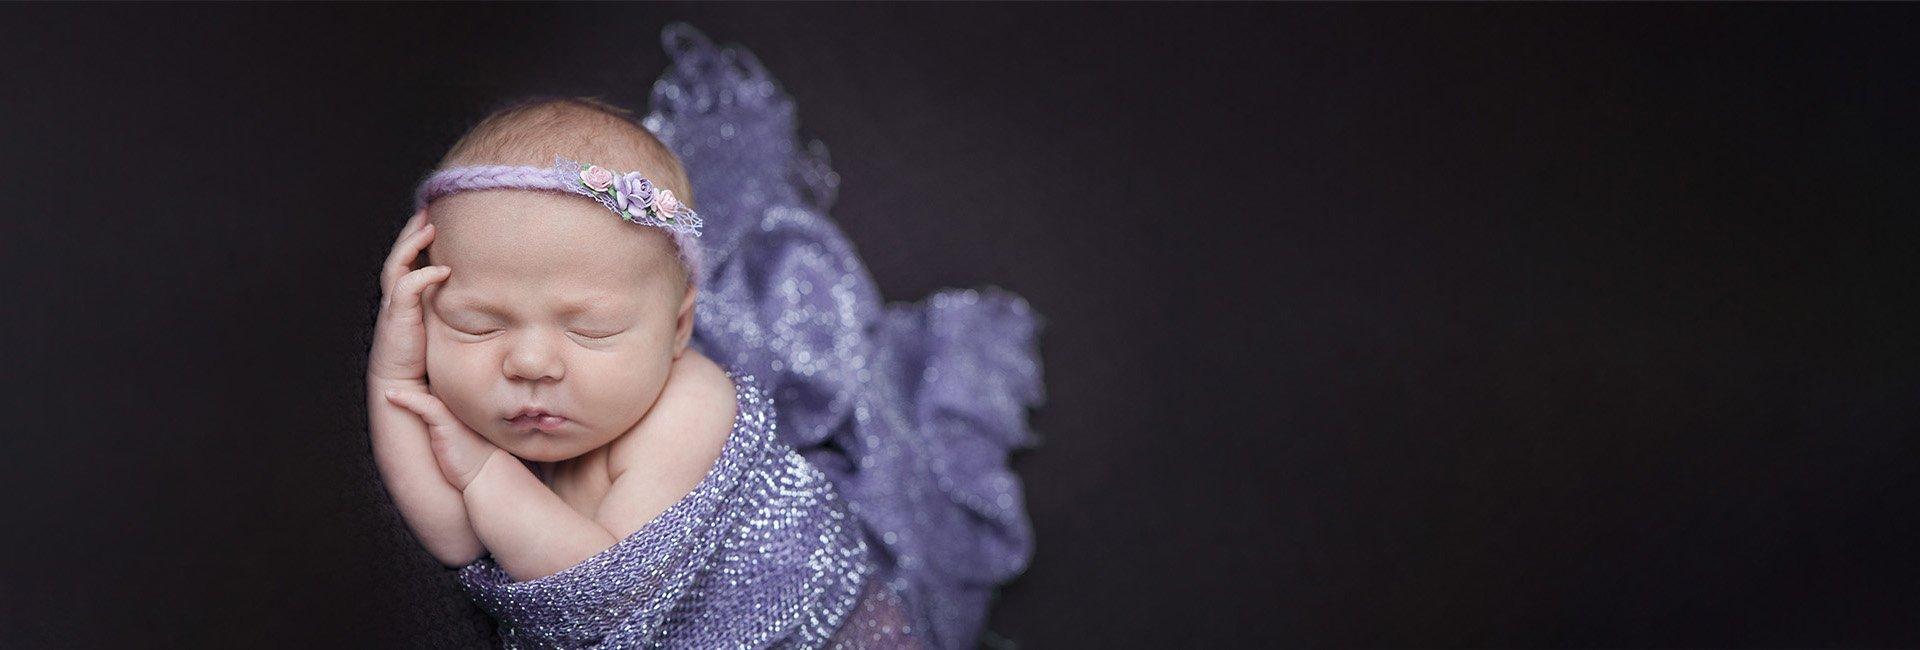 Baby_Girl_newborn_photography_melbourne